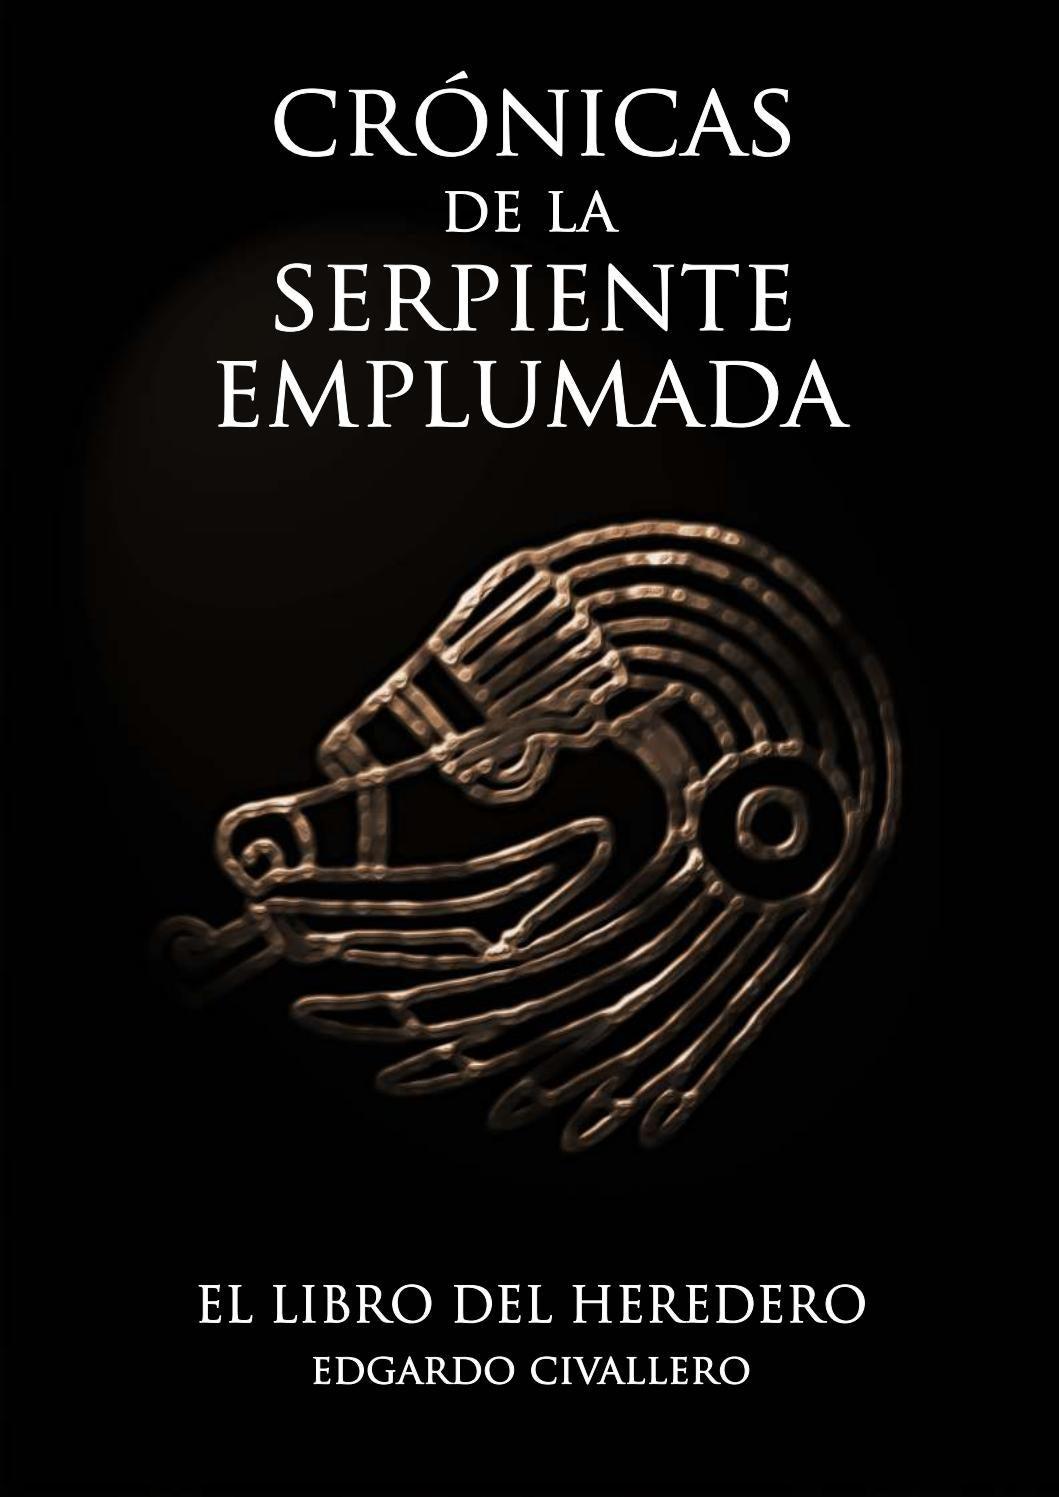 Solteros catolicos Guadalajara tengo 120 cundinamarca